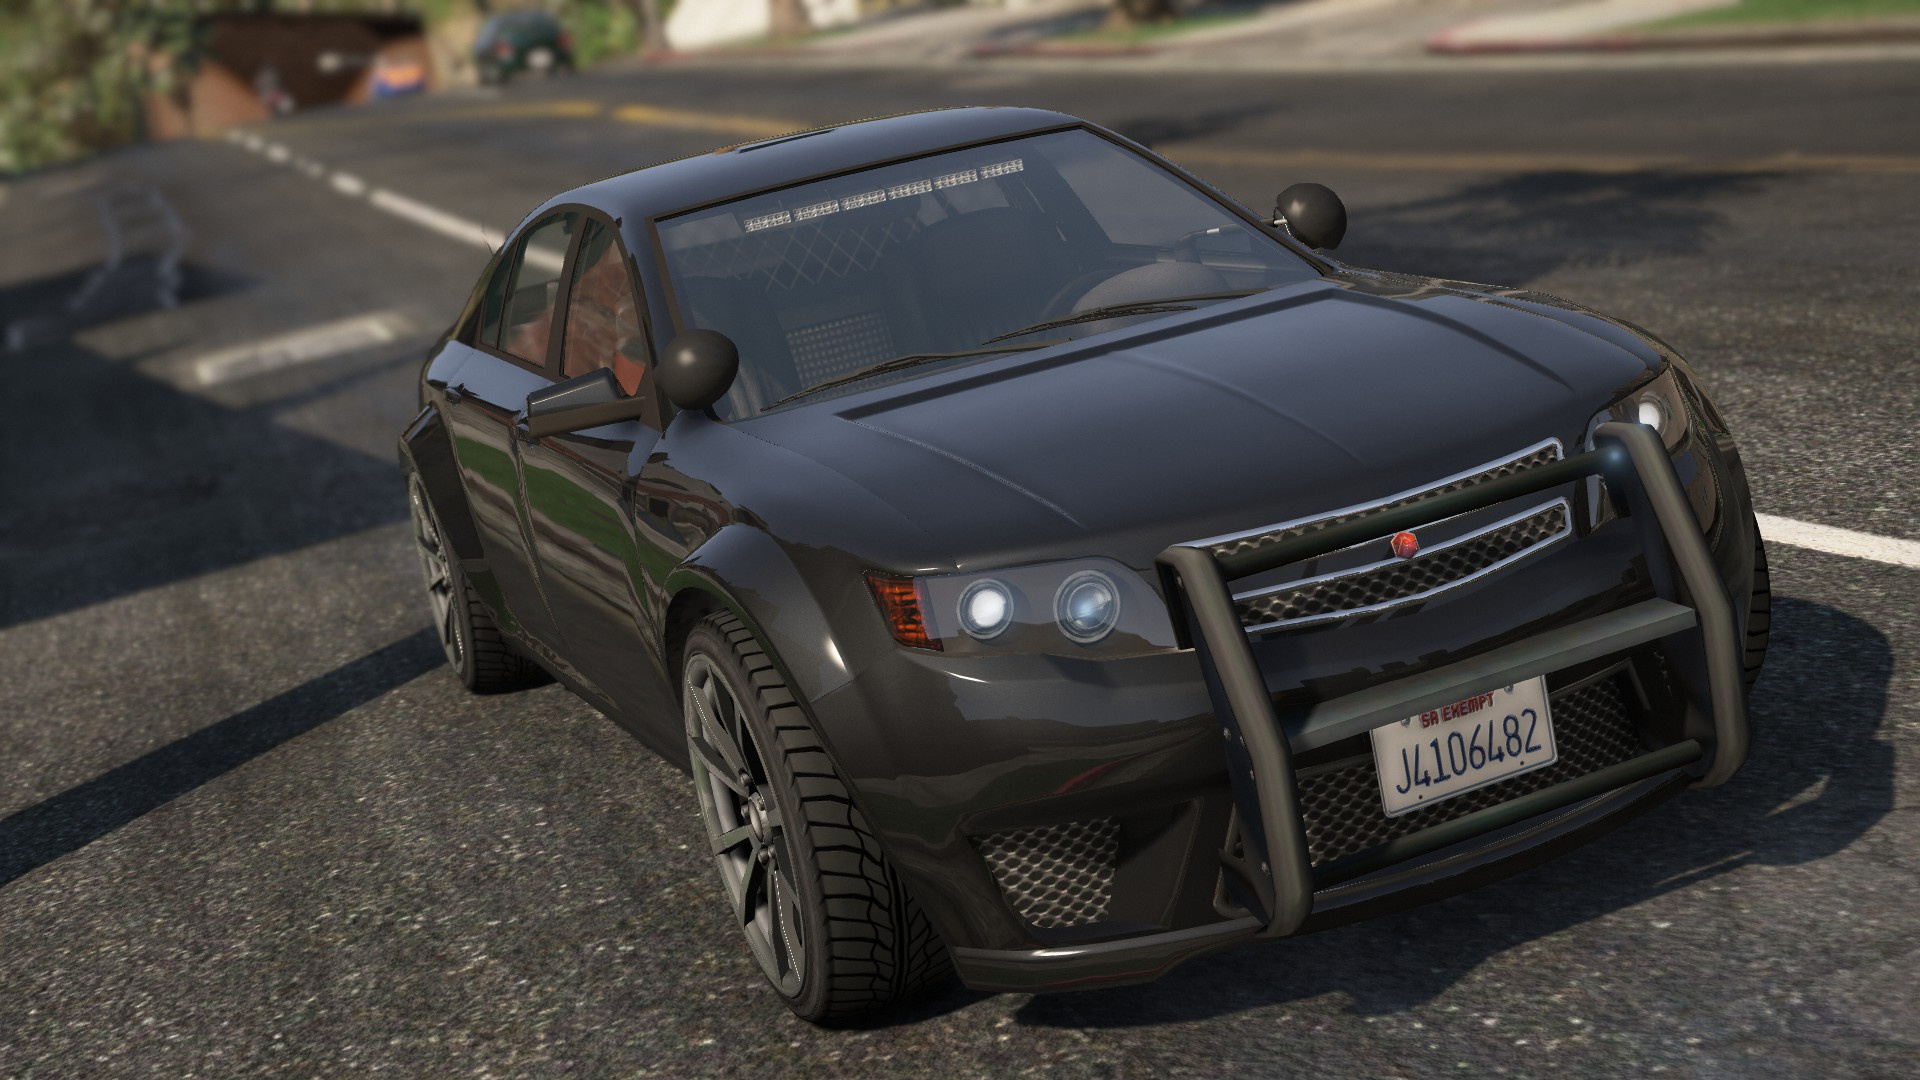 FIB Unmarked/Undercover Cheval Fugitive - GTA5-Mods.com